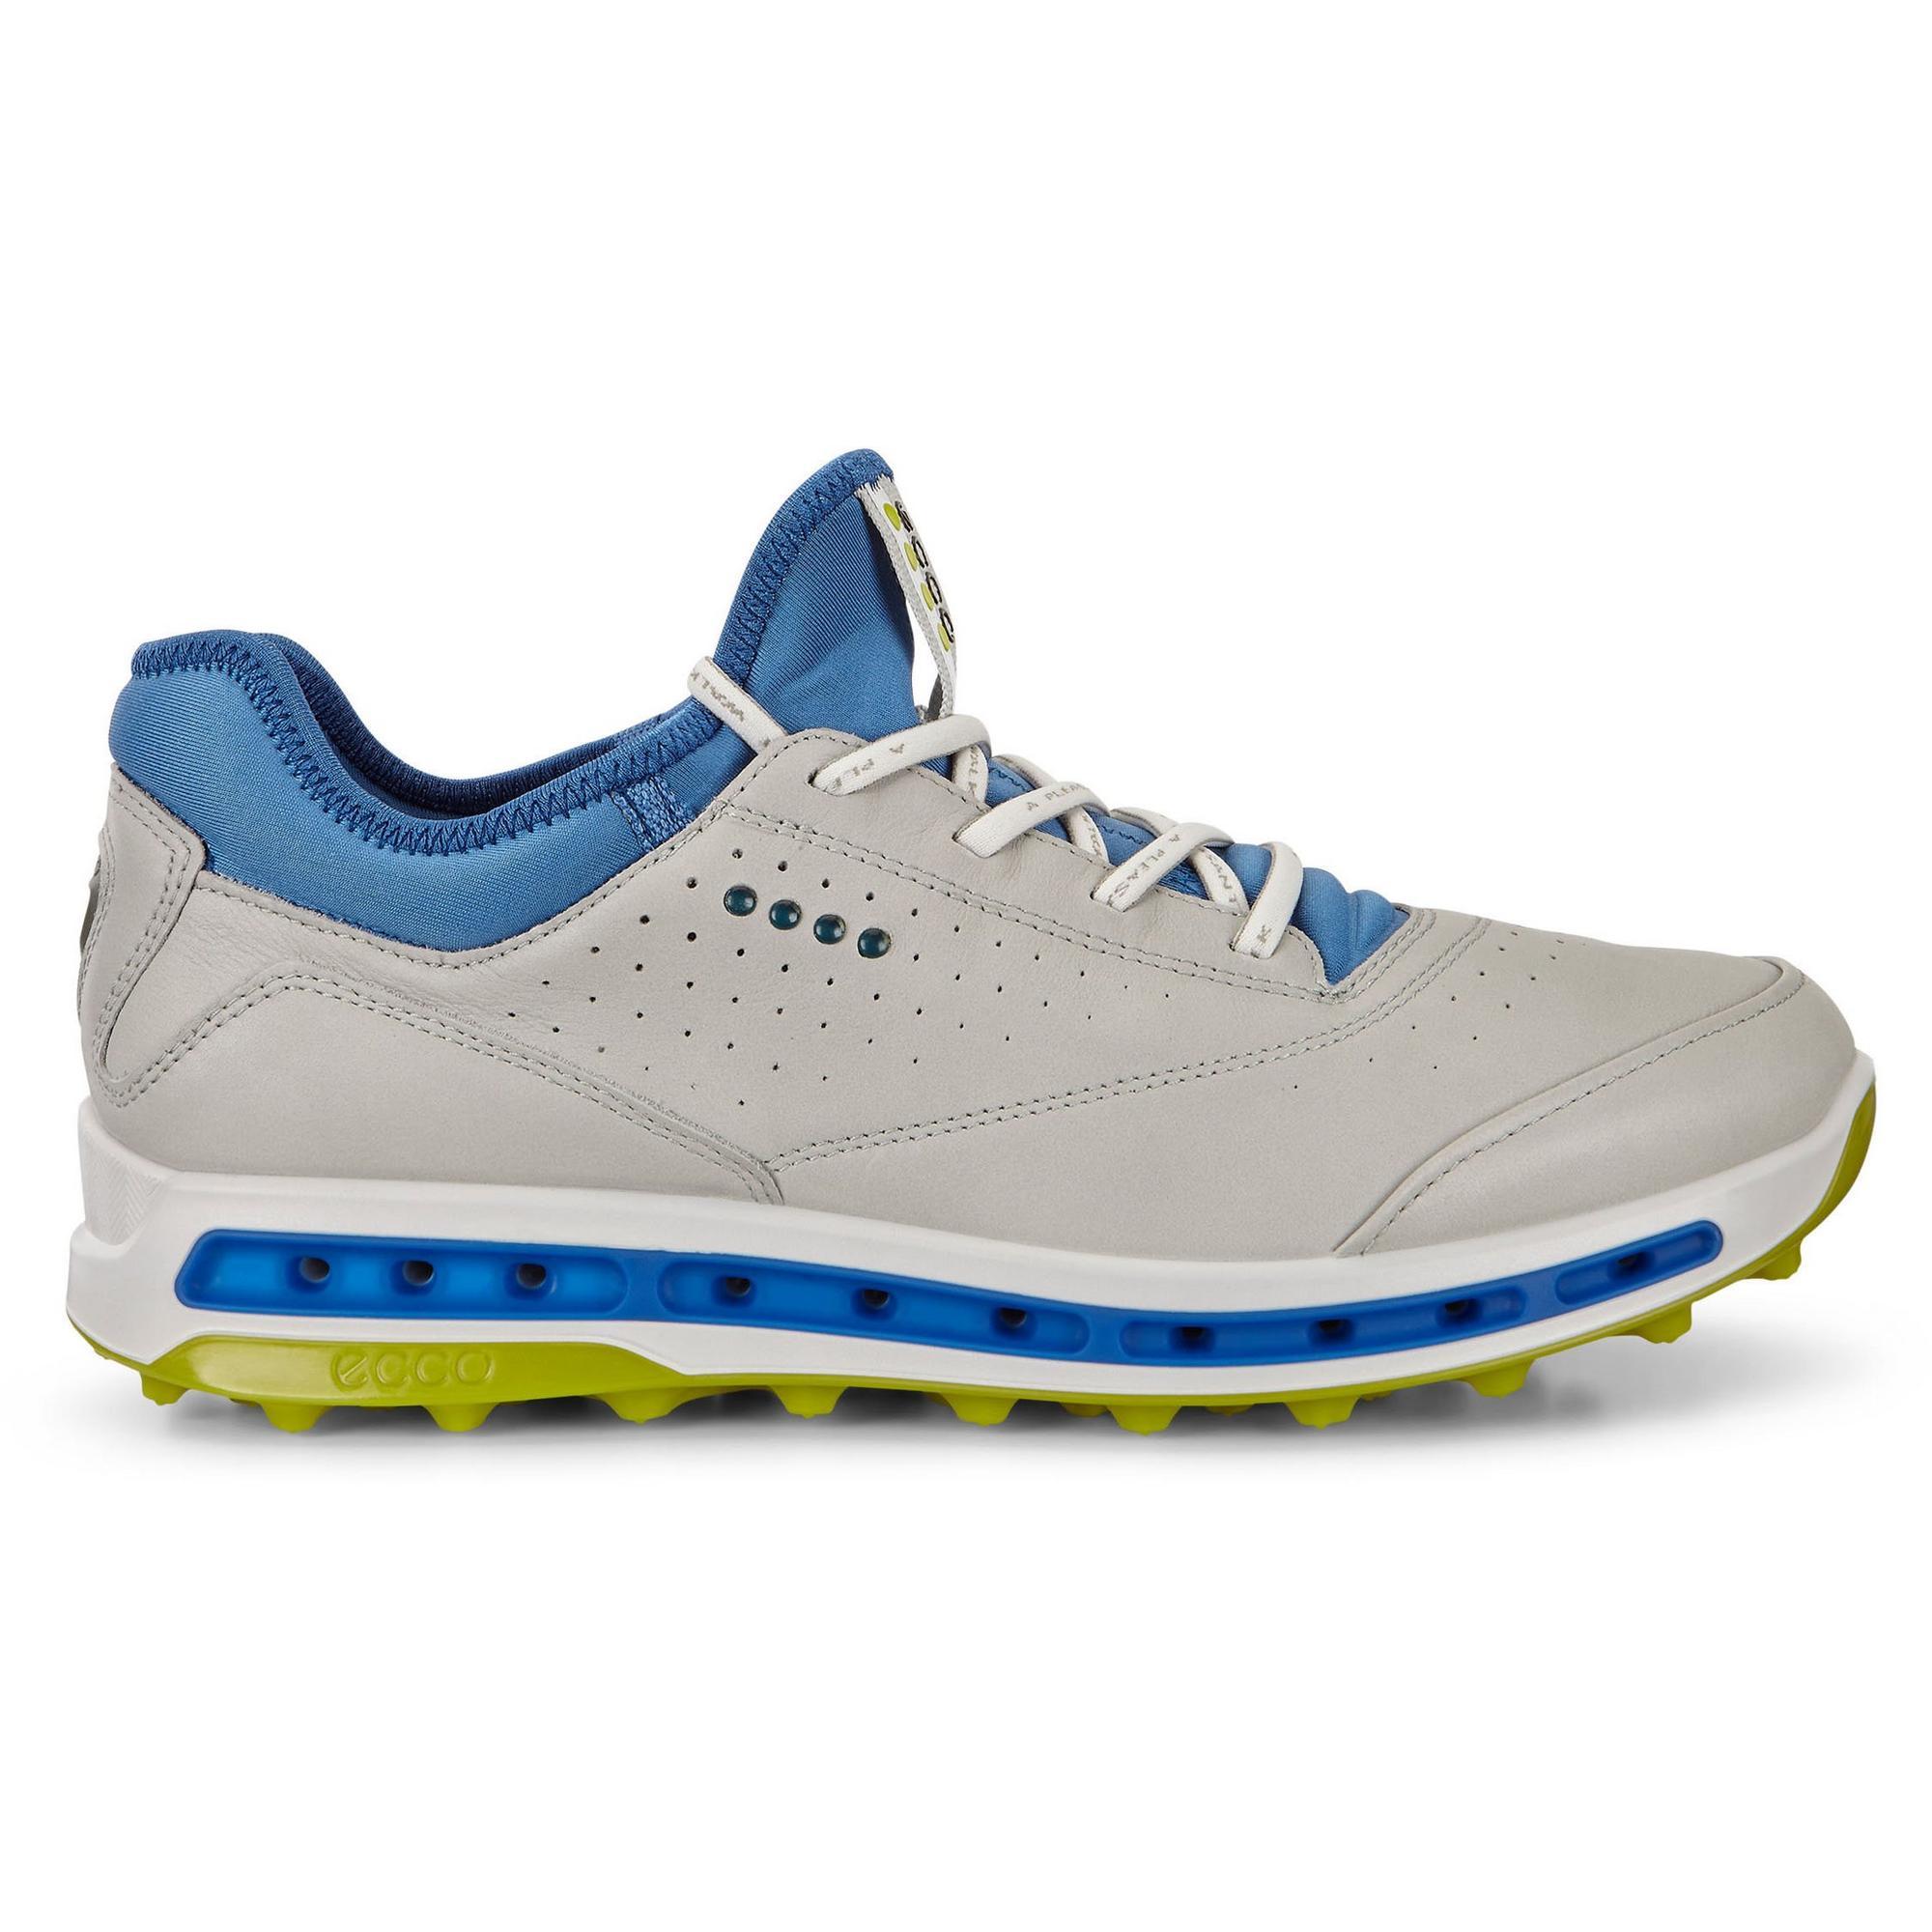 Men's Goretex Cool Pro Spikeless Golf Shoe - GRY/GRN